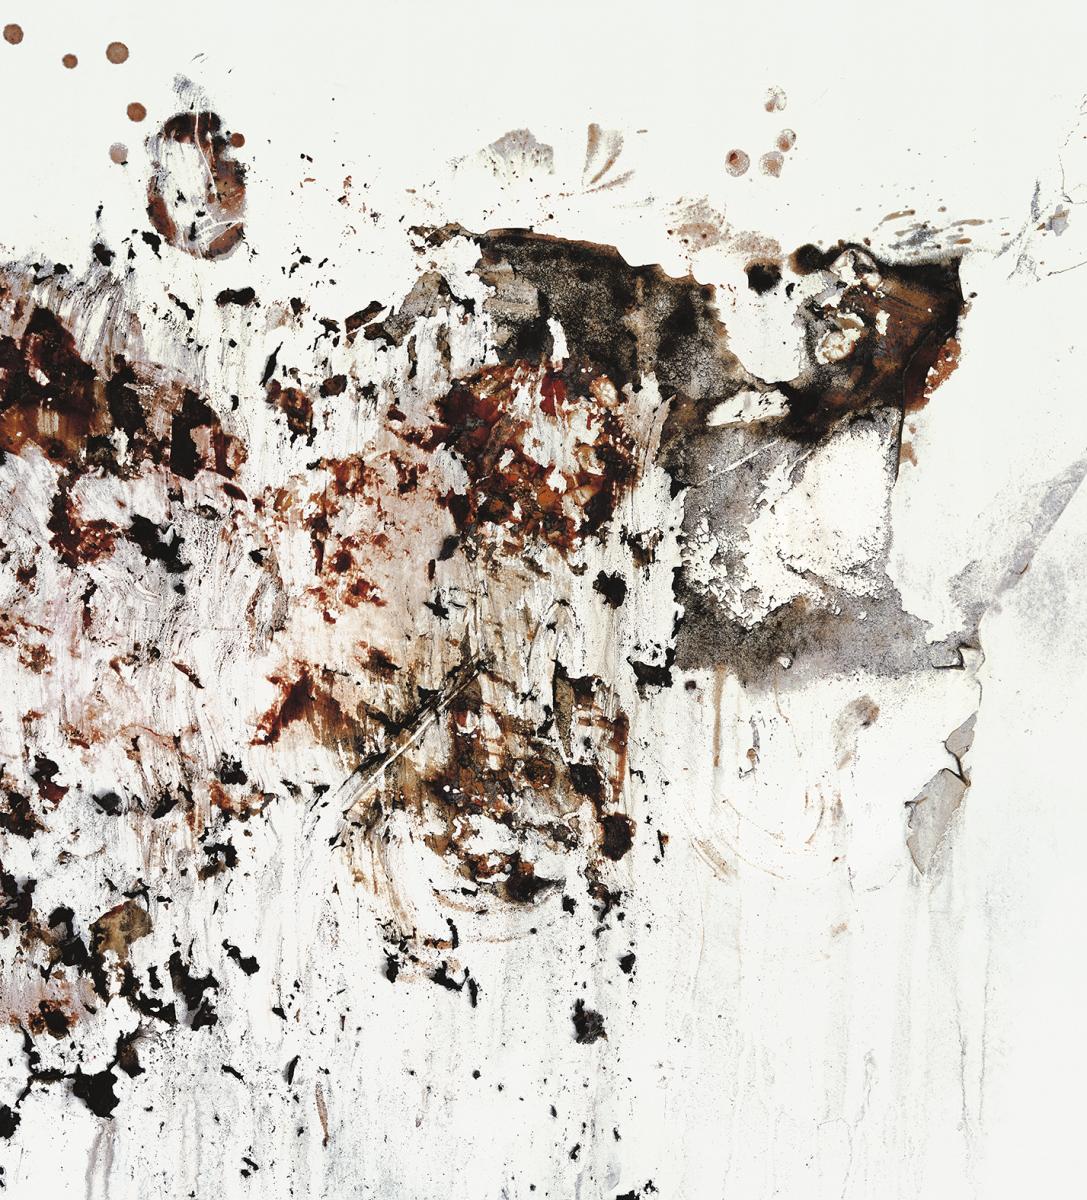 Filip Berendt, Pandemic VII, 2009, photography archival print on dibond ed.62AP, 60 x 50 cm